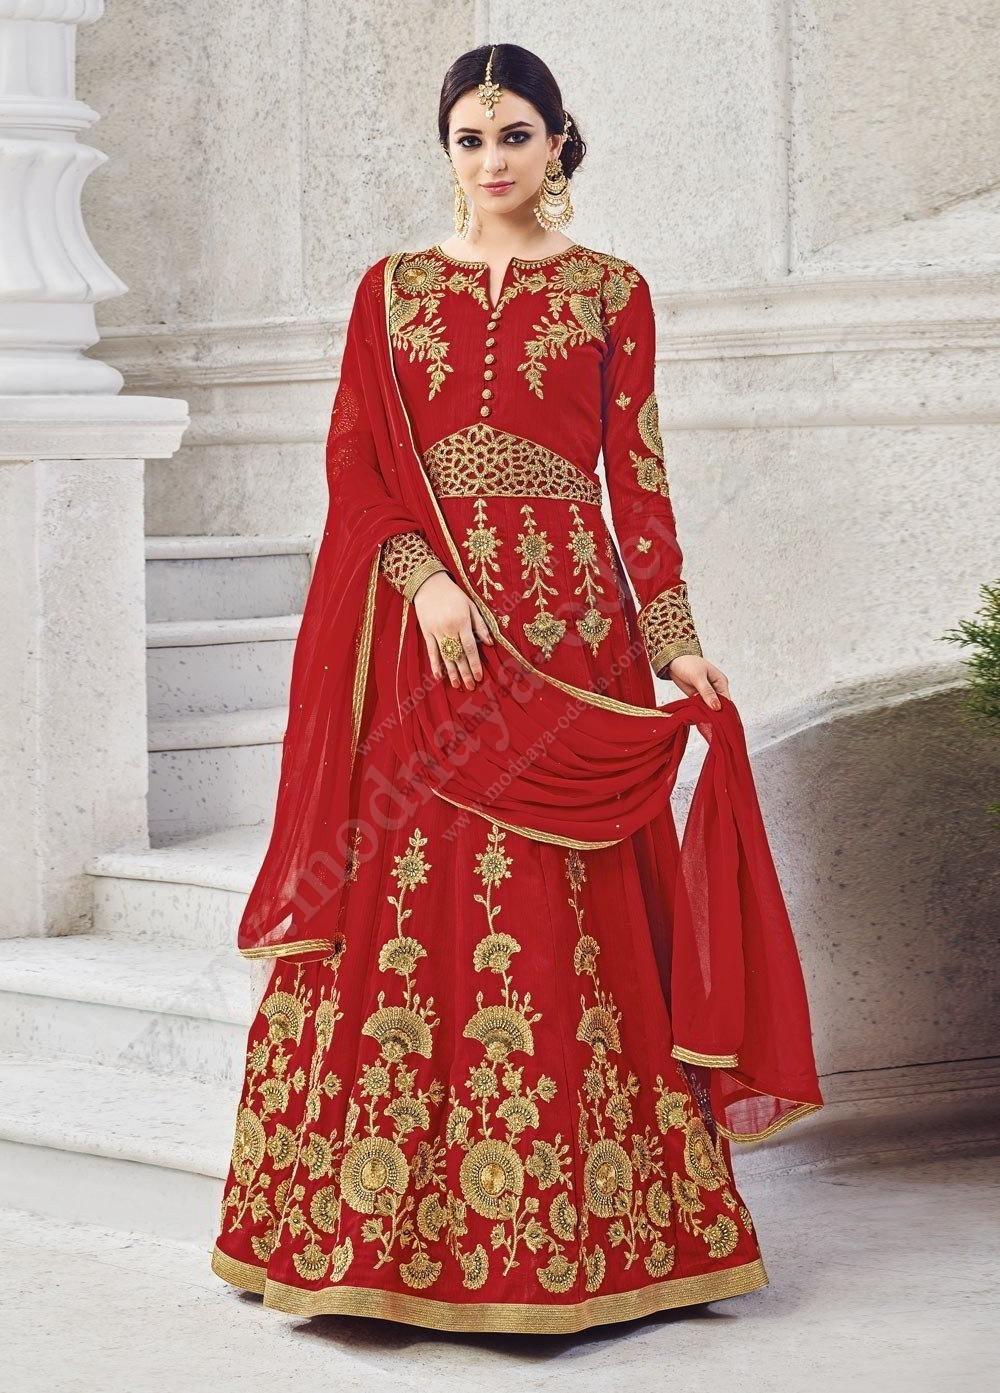 Coolste Elegantes Rotes Kleid Bester Preis Genial Elegantes Rotes Kleid Design